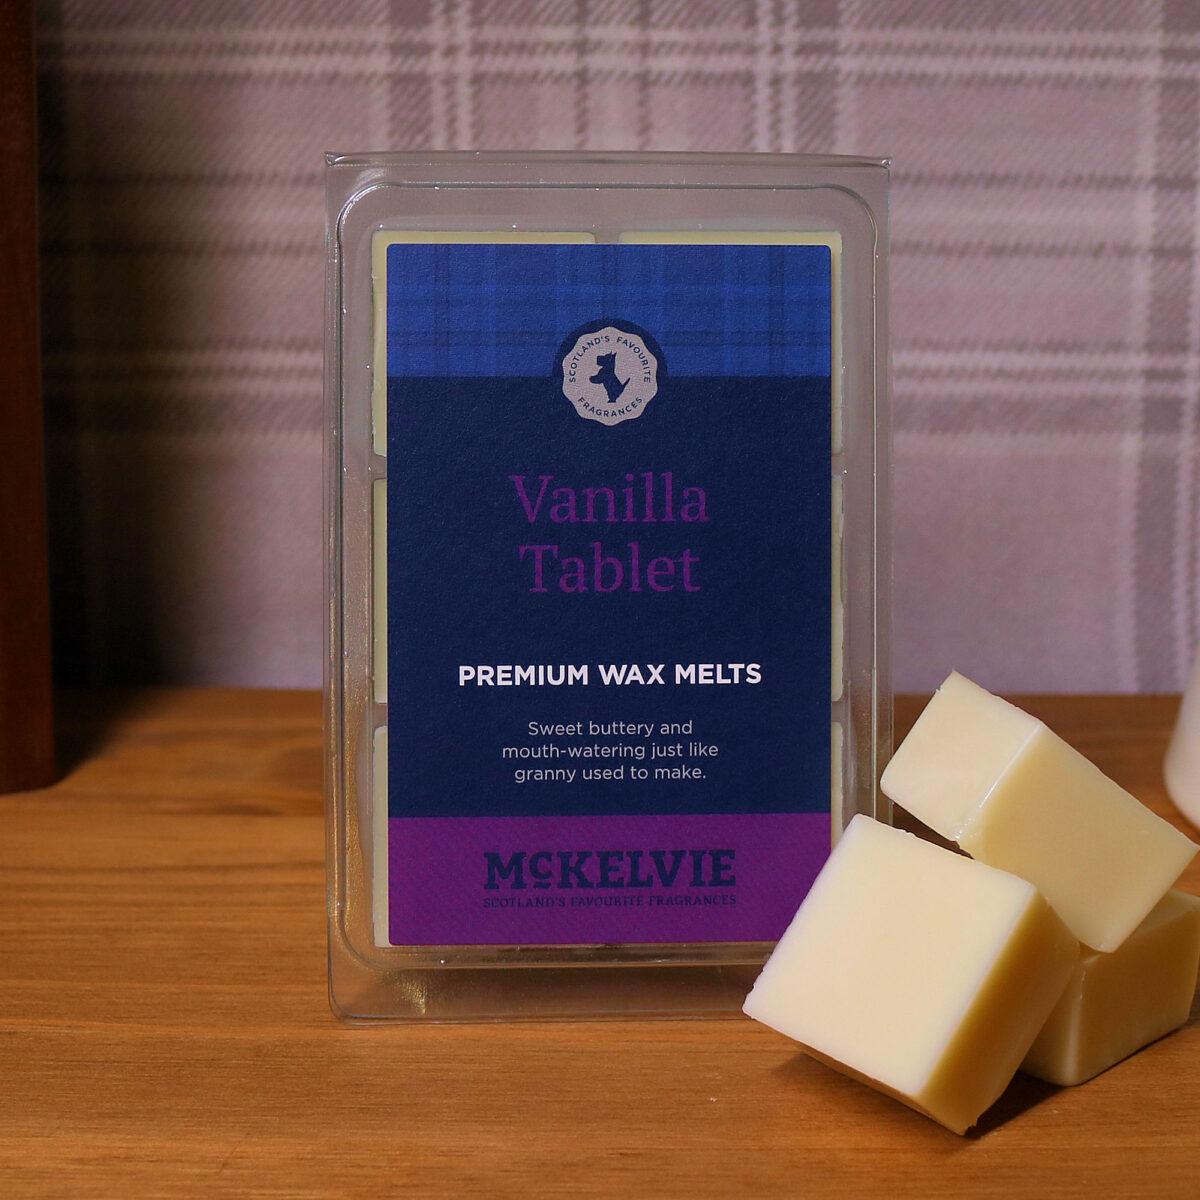 Vanilla Tablet Wax Melts